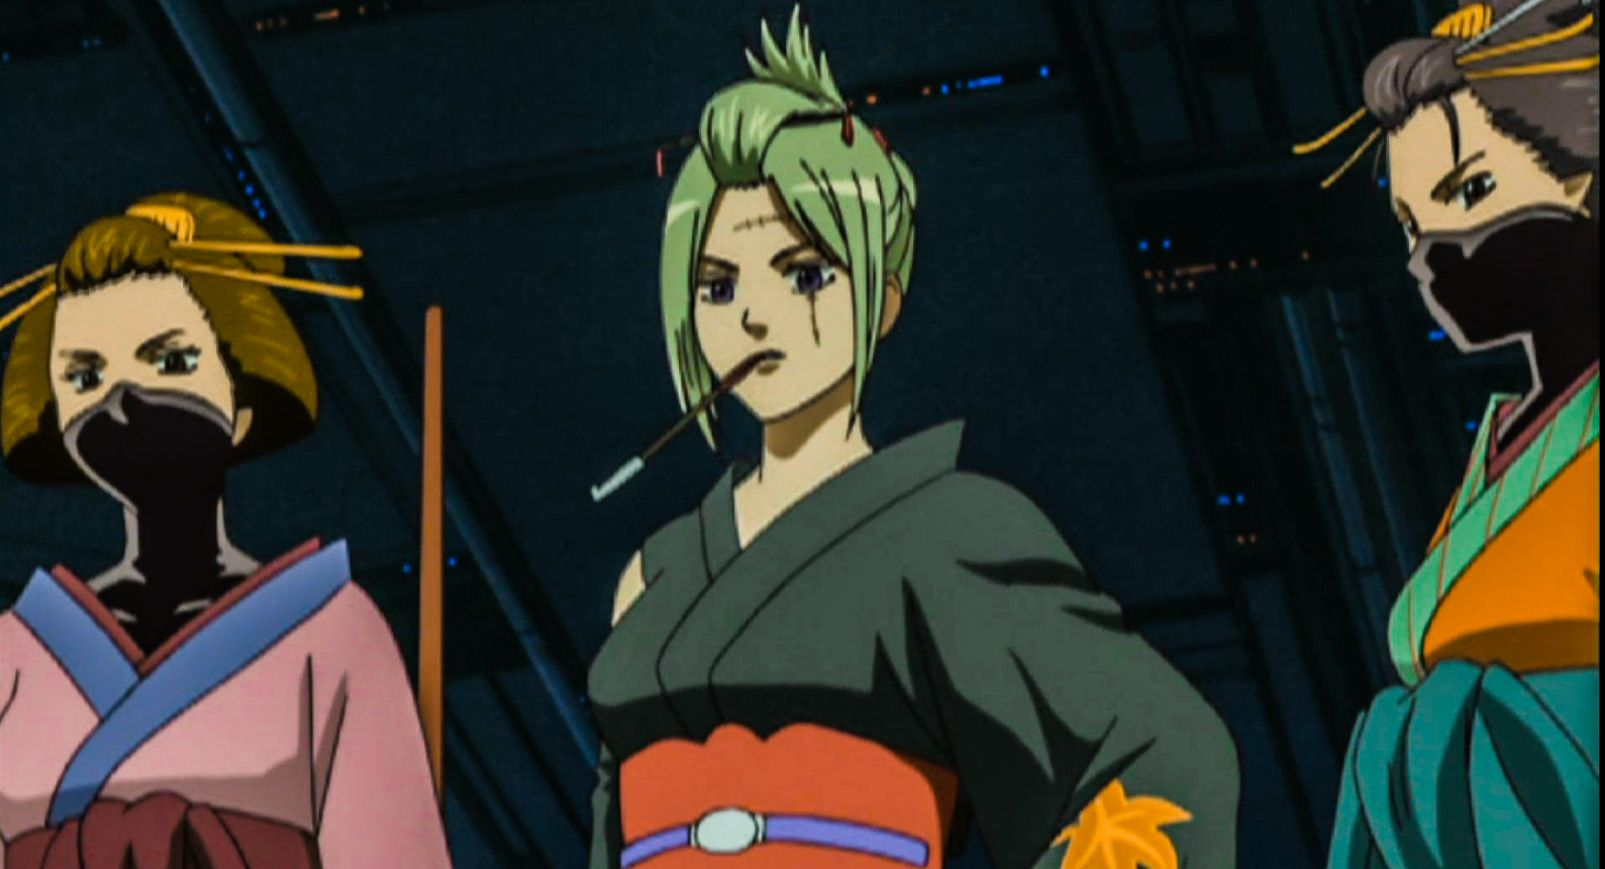 yoshiwara Anime reviews, Anime